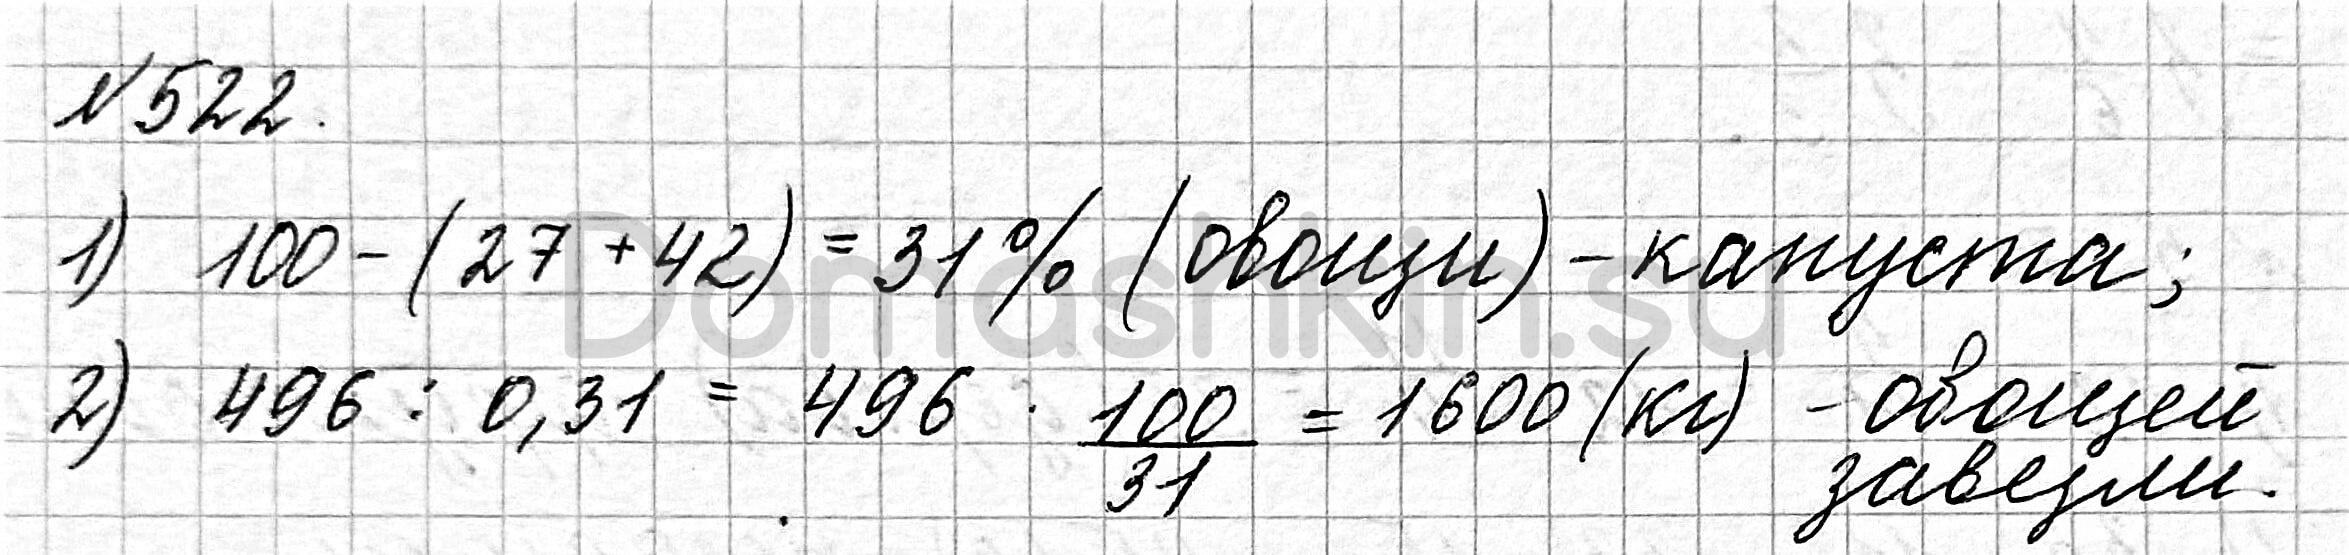 Математика 6 класс учебник Мерзляк номер 522 решение